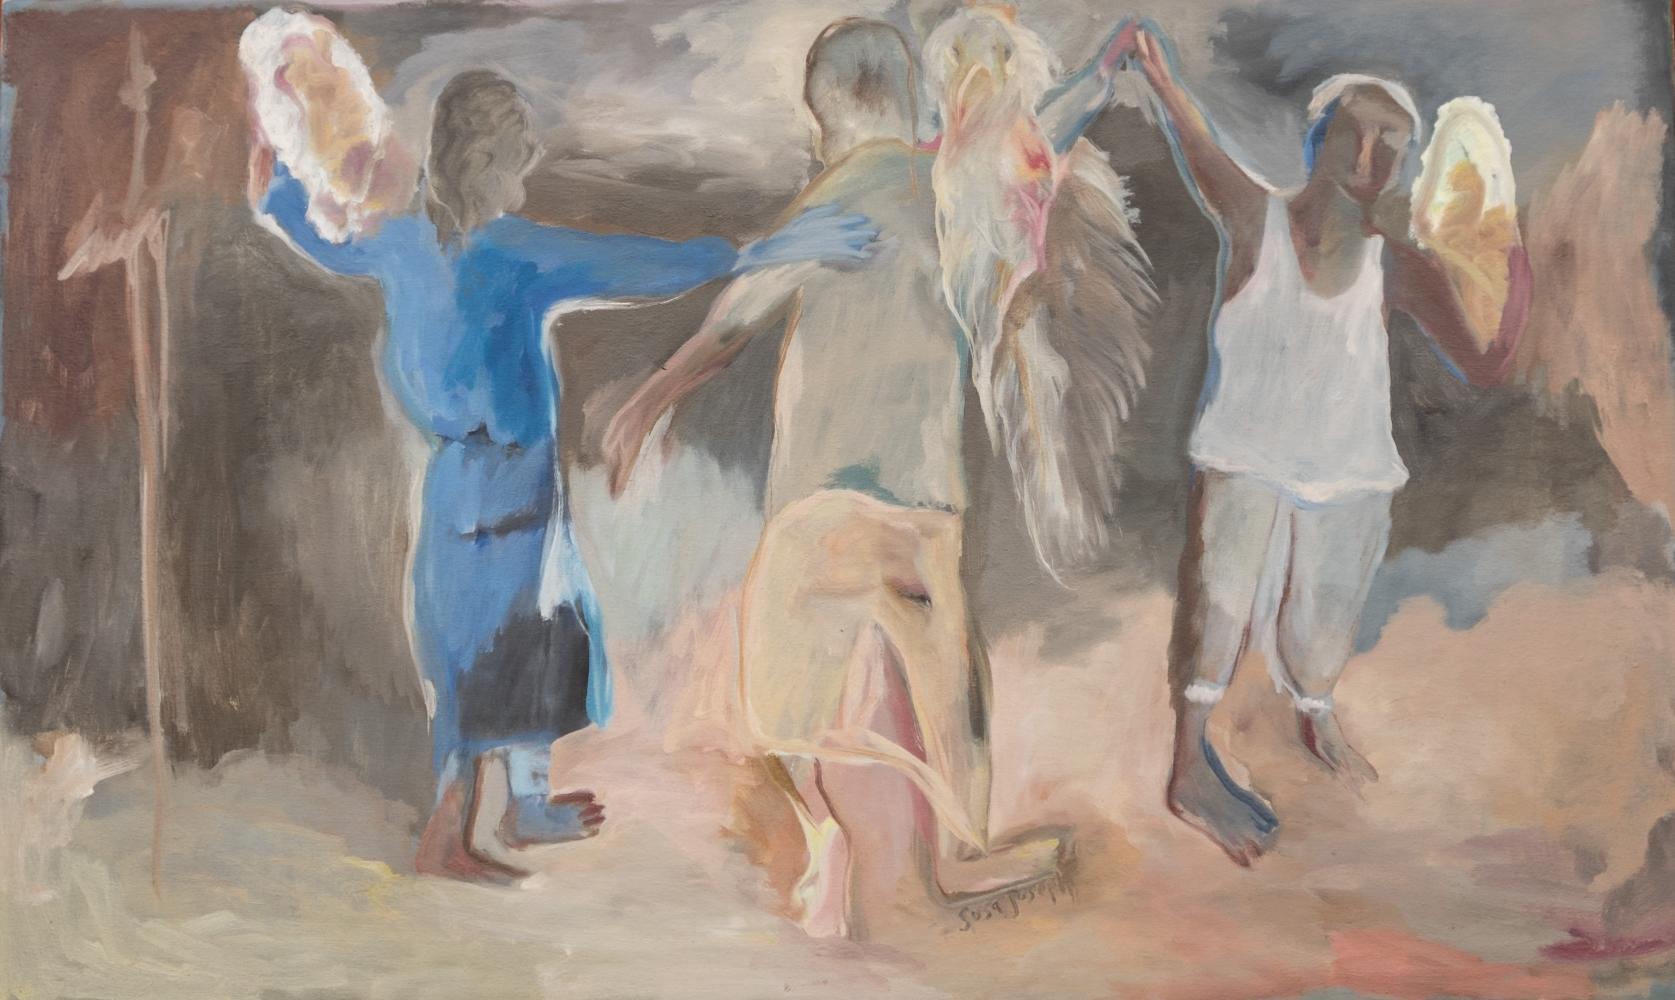 Sosa Joseph Three Men, 2015, oil on canvas, 91.4 x 122 cm / 36 x 48 in